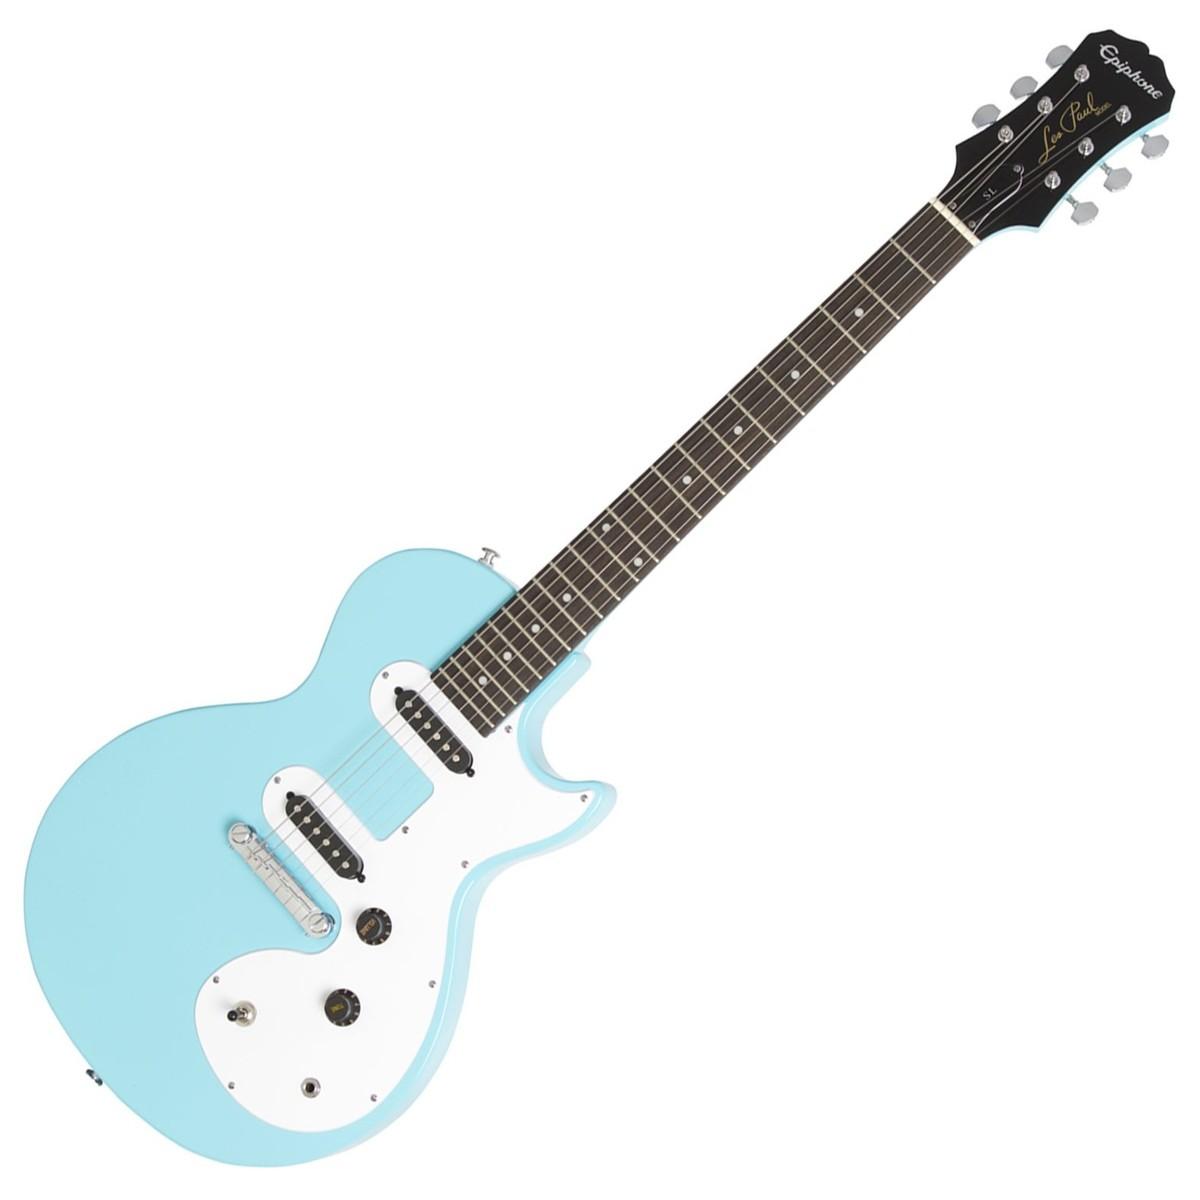 epiphone les paul sl electric guitar pacific blue at. Black Bedroom Furniture Sets. Home Design Ideas